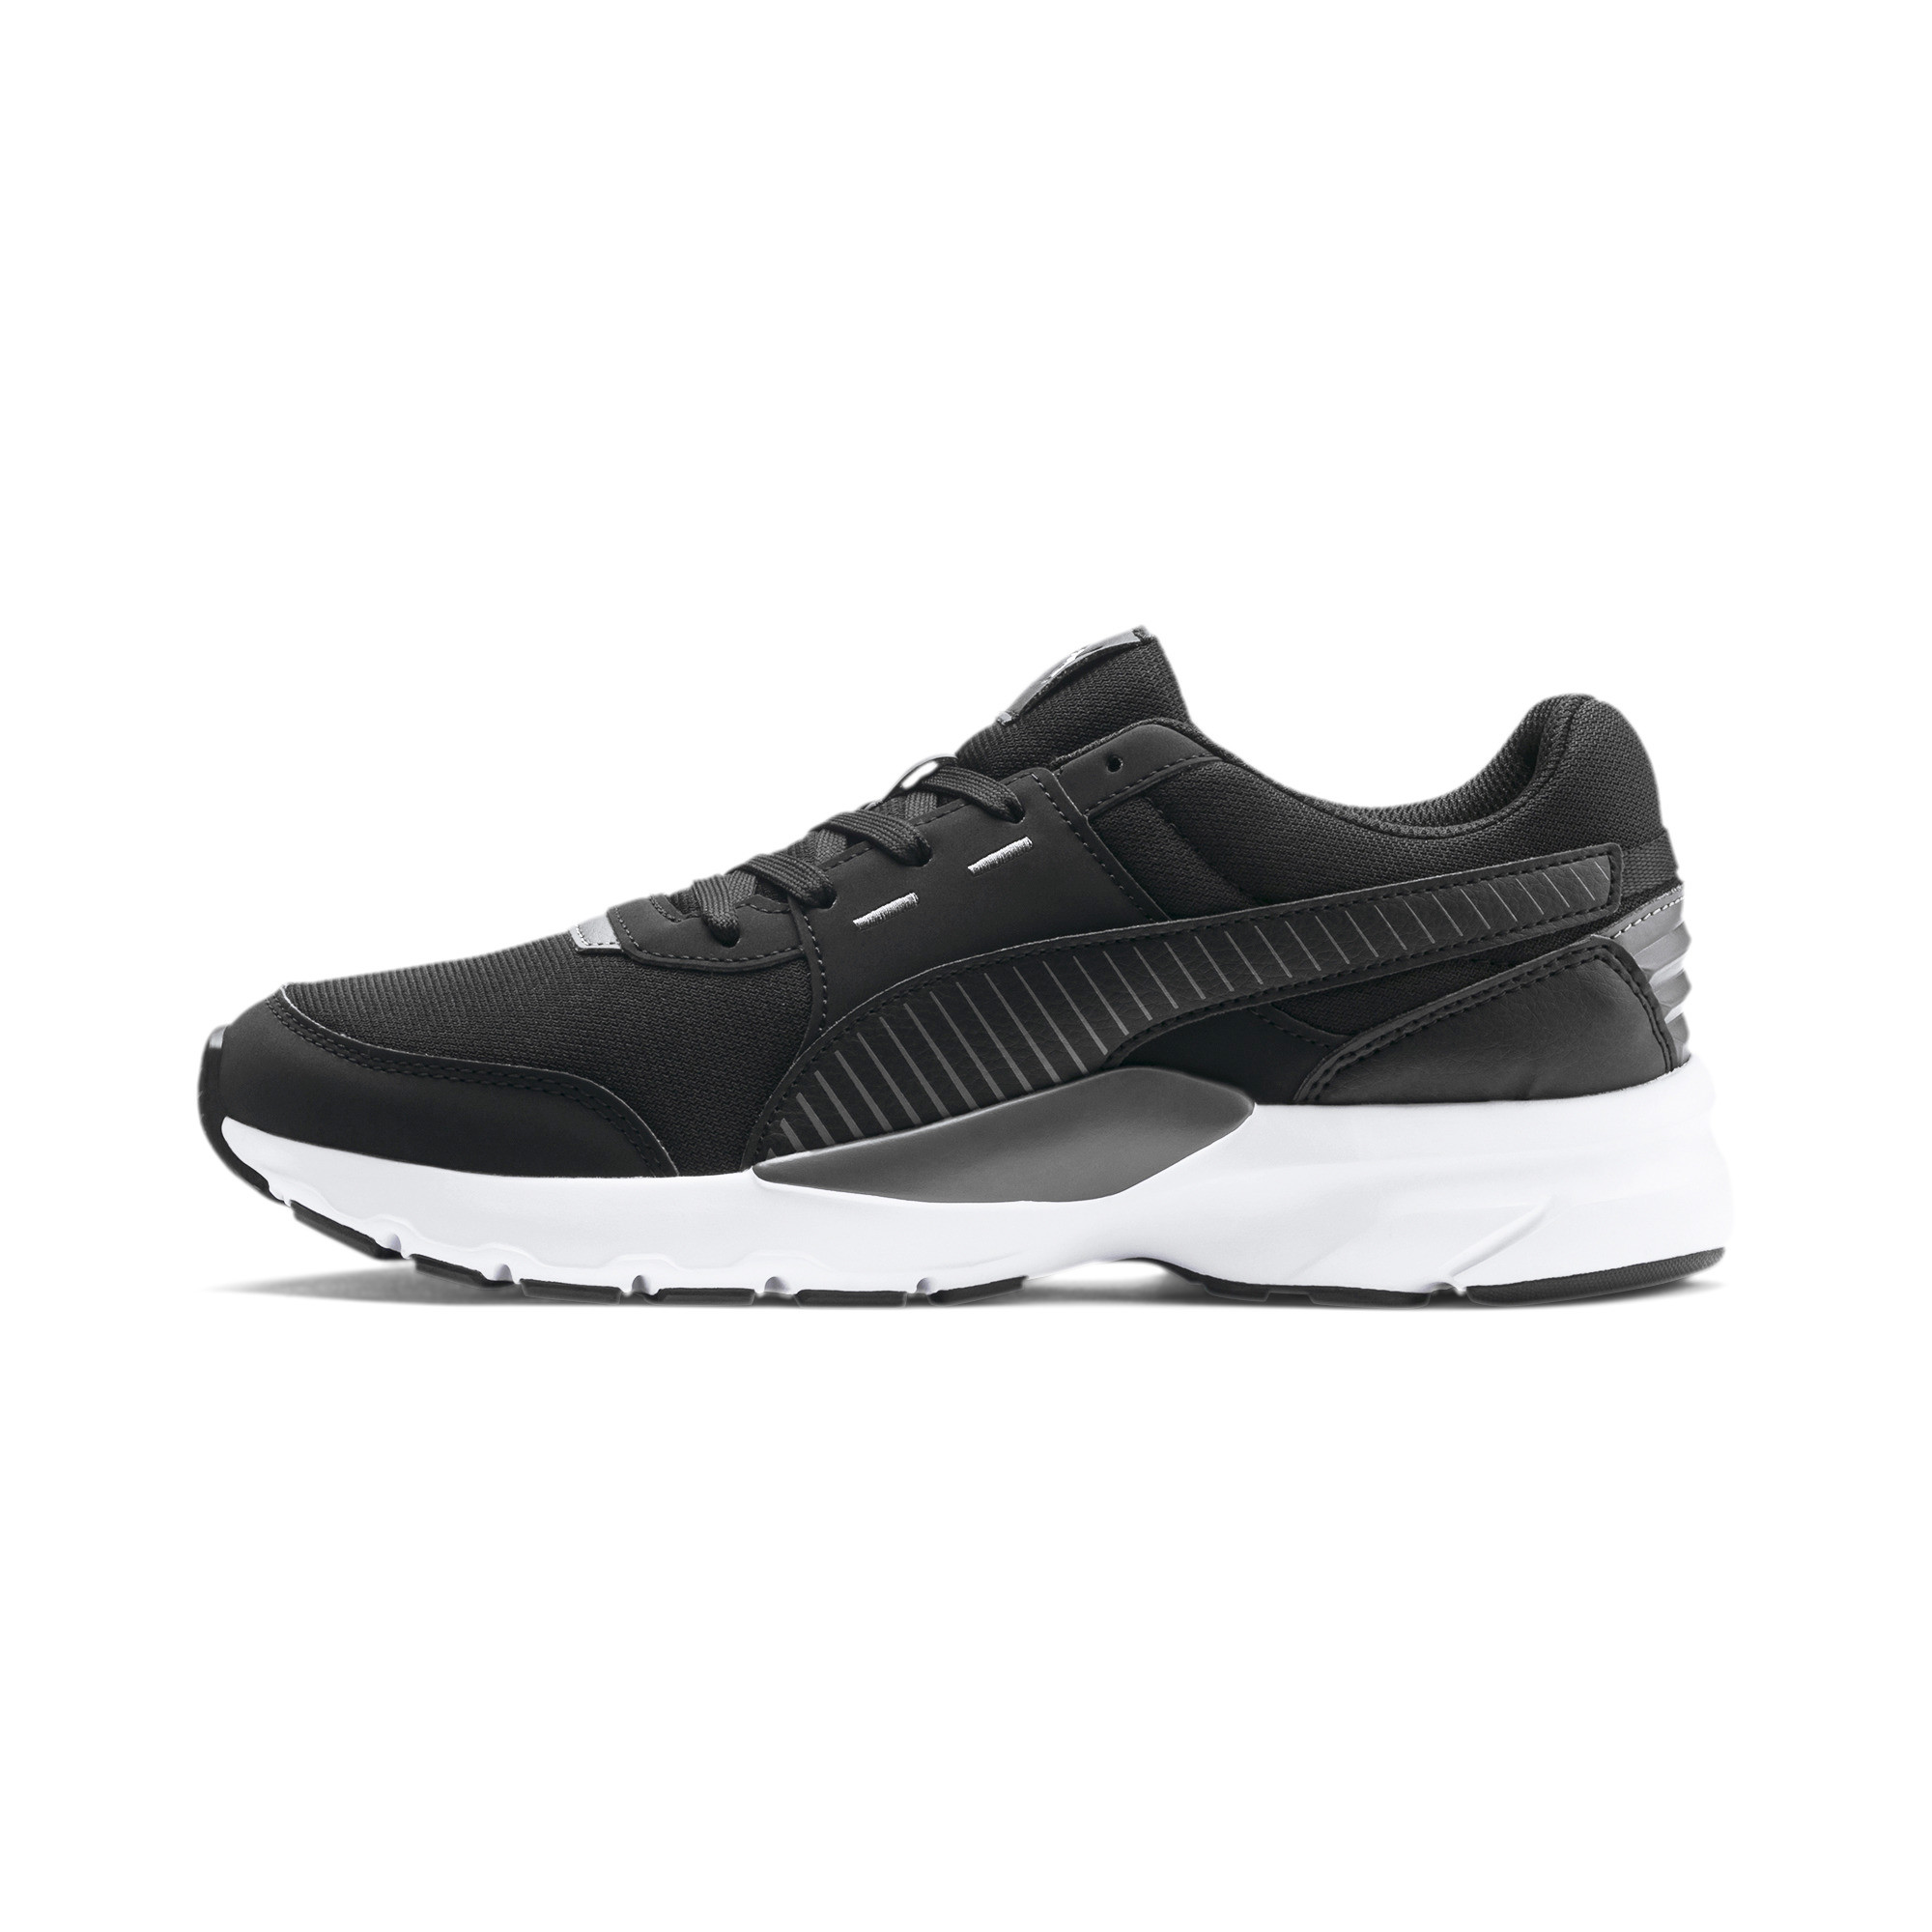 PUMA-Future-Runner-SL-Sneaker-Unisex-Schuhe-Basics-Neu Indexbild 12